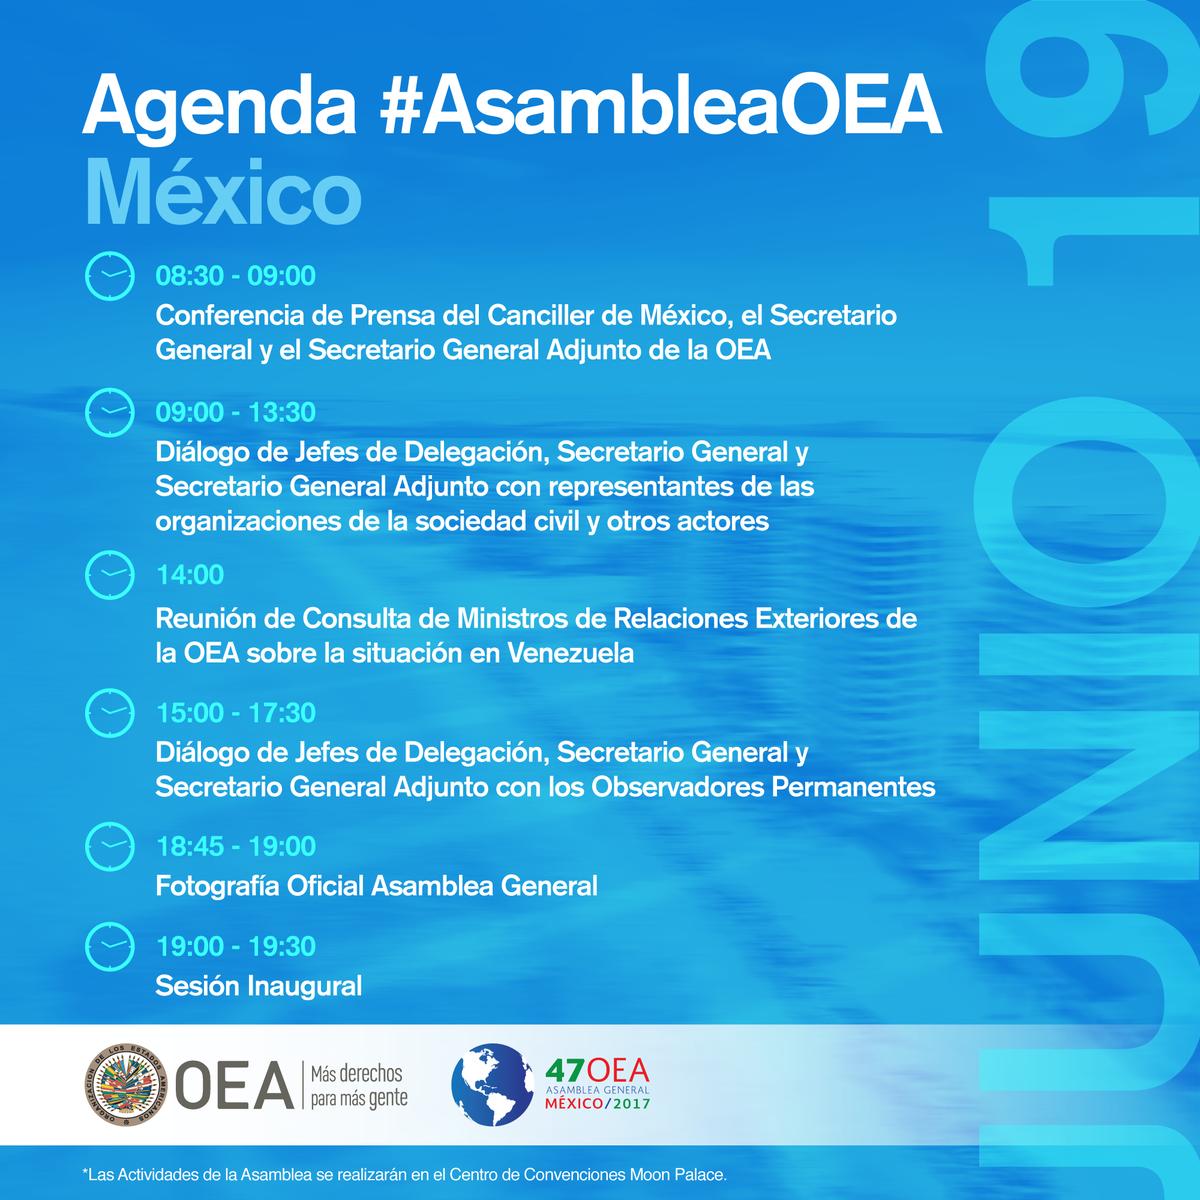 [AGENDA 19 DE JUNIO] #AsambleaOEA @gobmx @SRE_mx  Más información: htt...